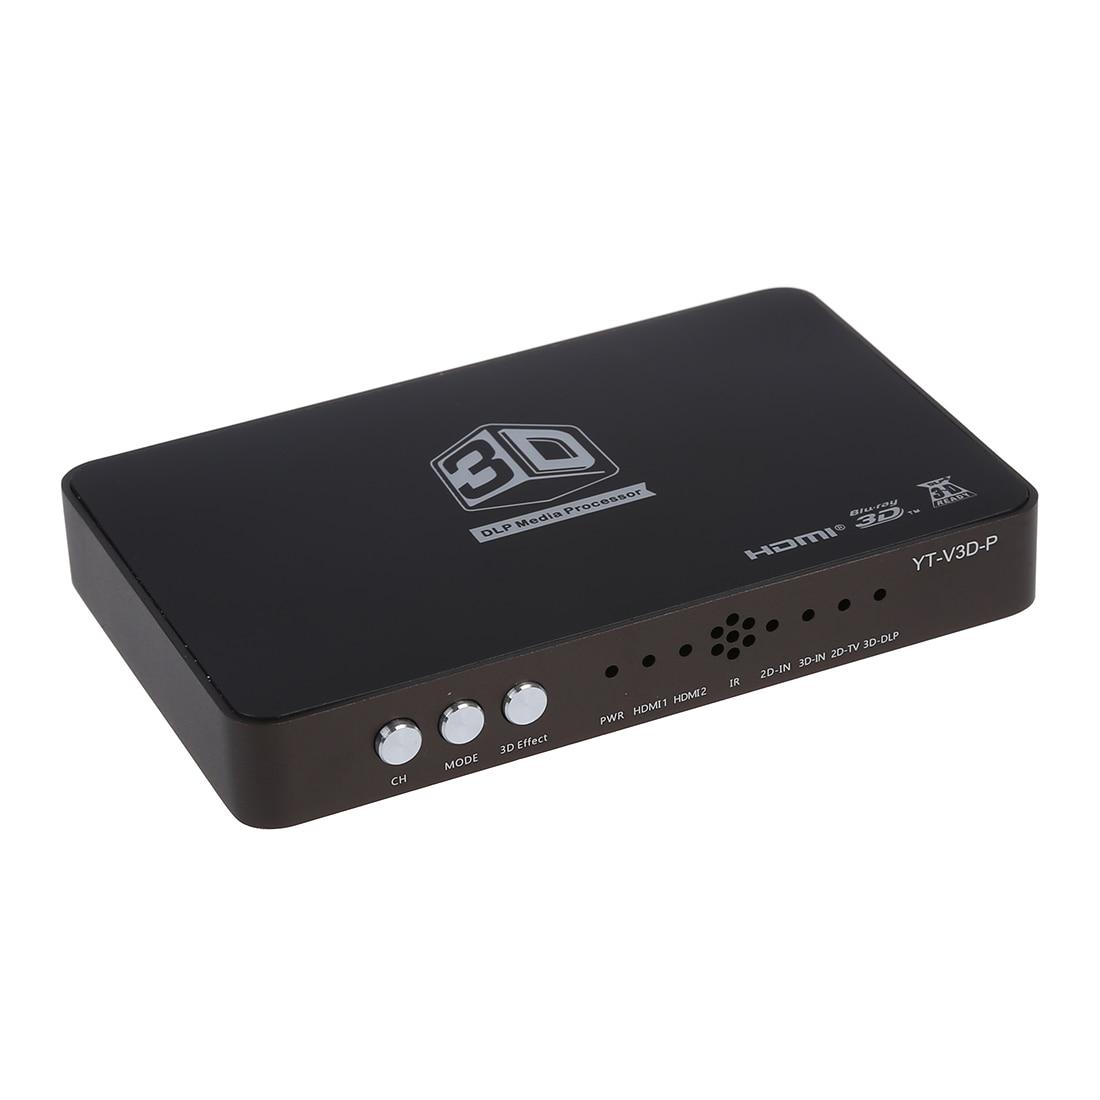 Youting 3d DLP Converter 2x1 Hdmi 1.4 for 120hz 3d Ready DLP Projector Black 3d очки oem 3d dlp link dlp 3d optoma lg acer benq w1070 3d dlp cx 30